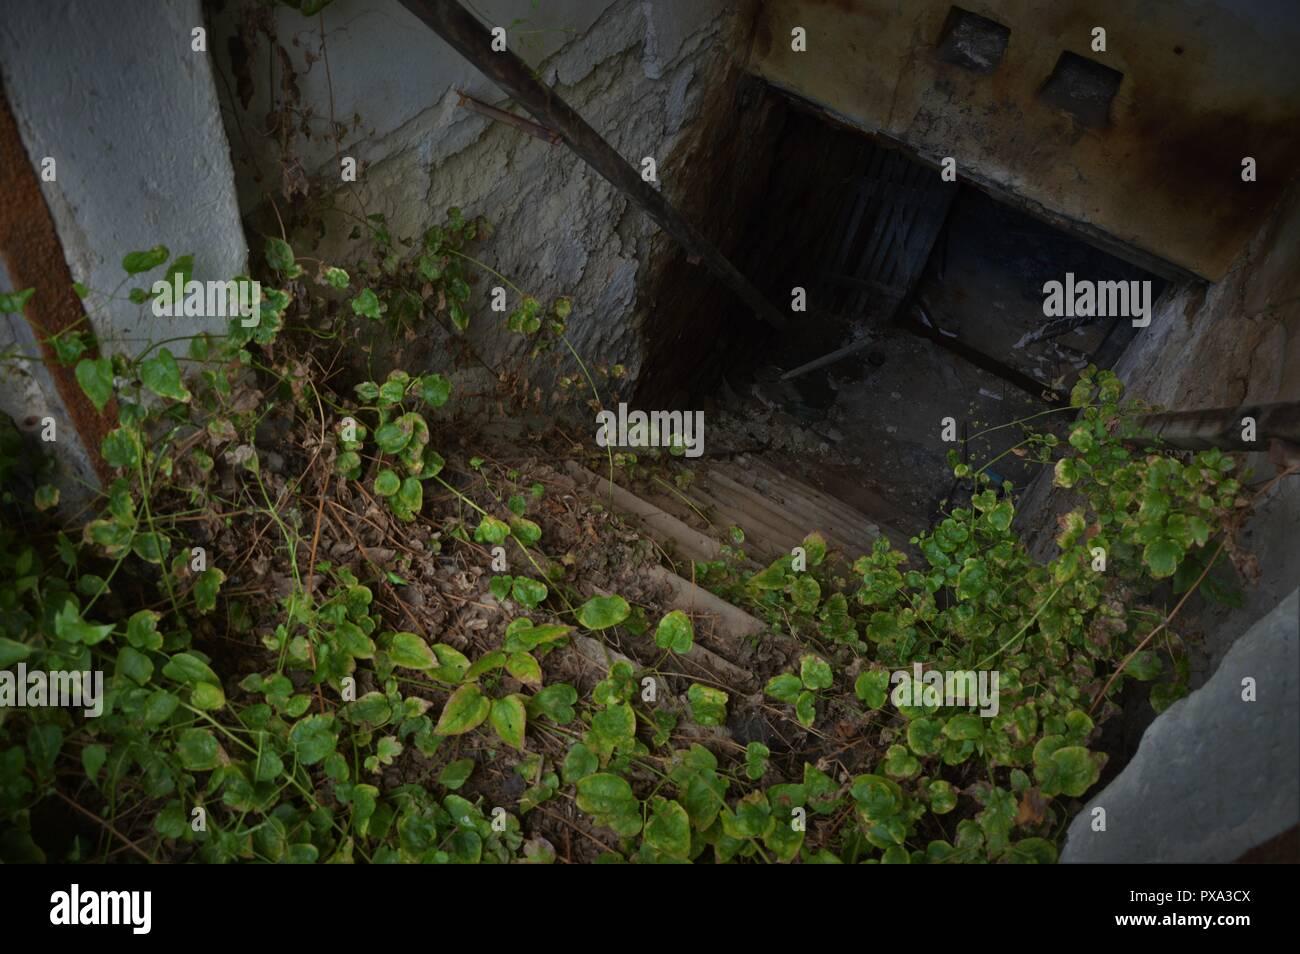 La entrada de una bodega abandonada - escena horroristic desde arriba Foto de stock